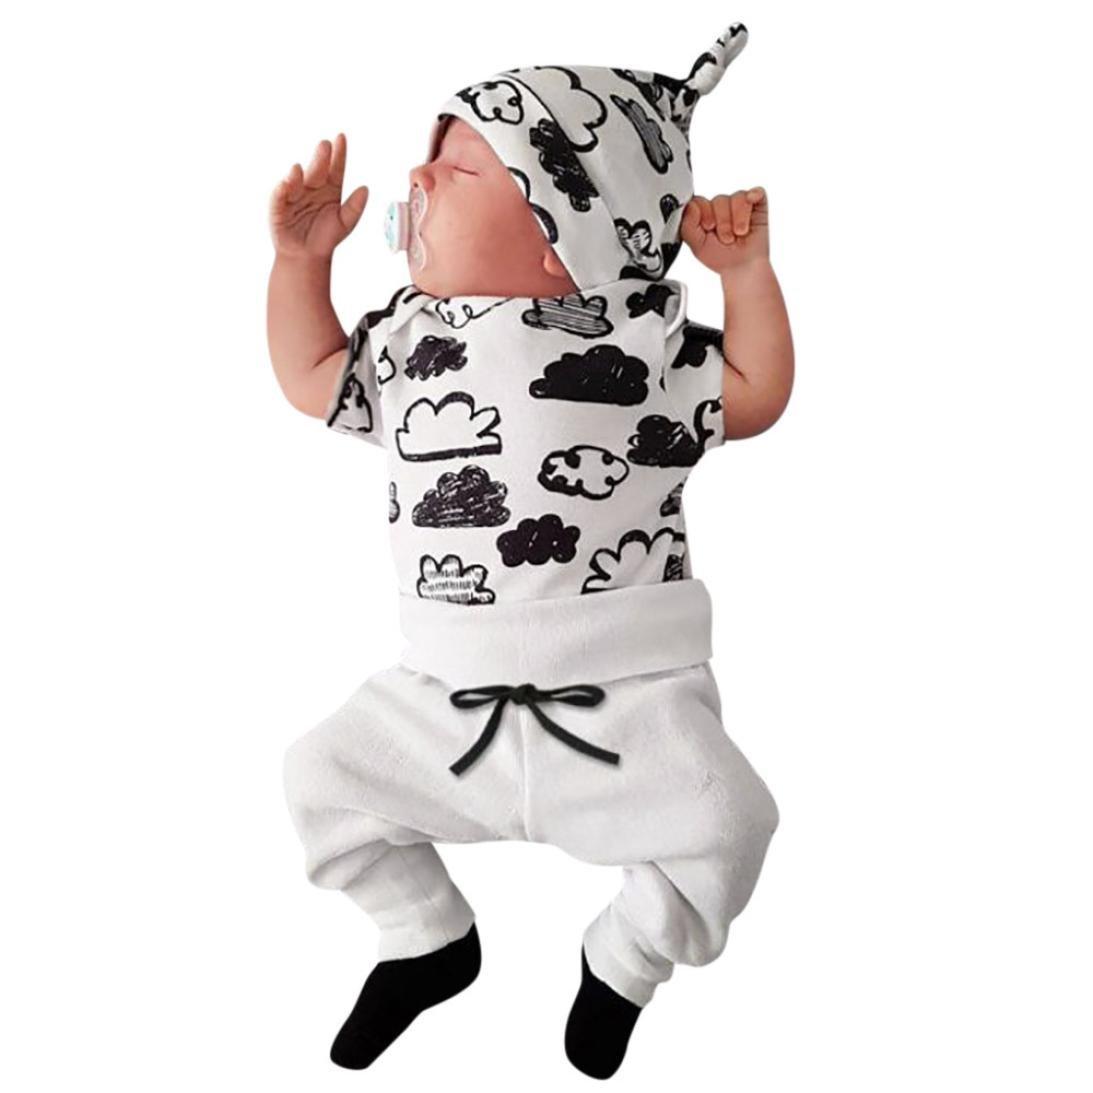 Conjunto Beb/é Verano ❤️ Amlaiworld Reci/én Nacido beb/é ni/ña ni/ño Nube impresi/ón Camiseta Tops Pantalones Trajes Ropa Conjunto